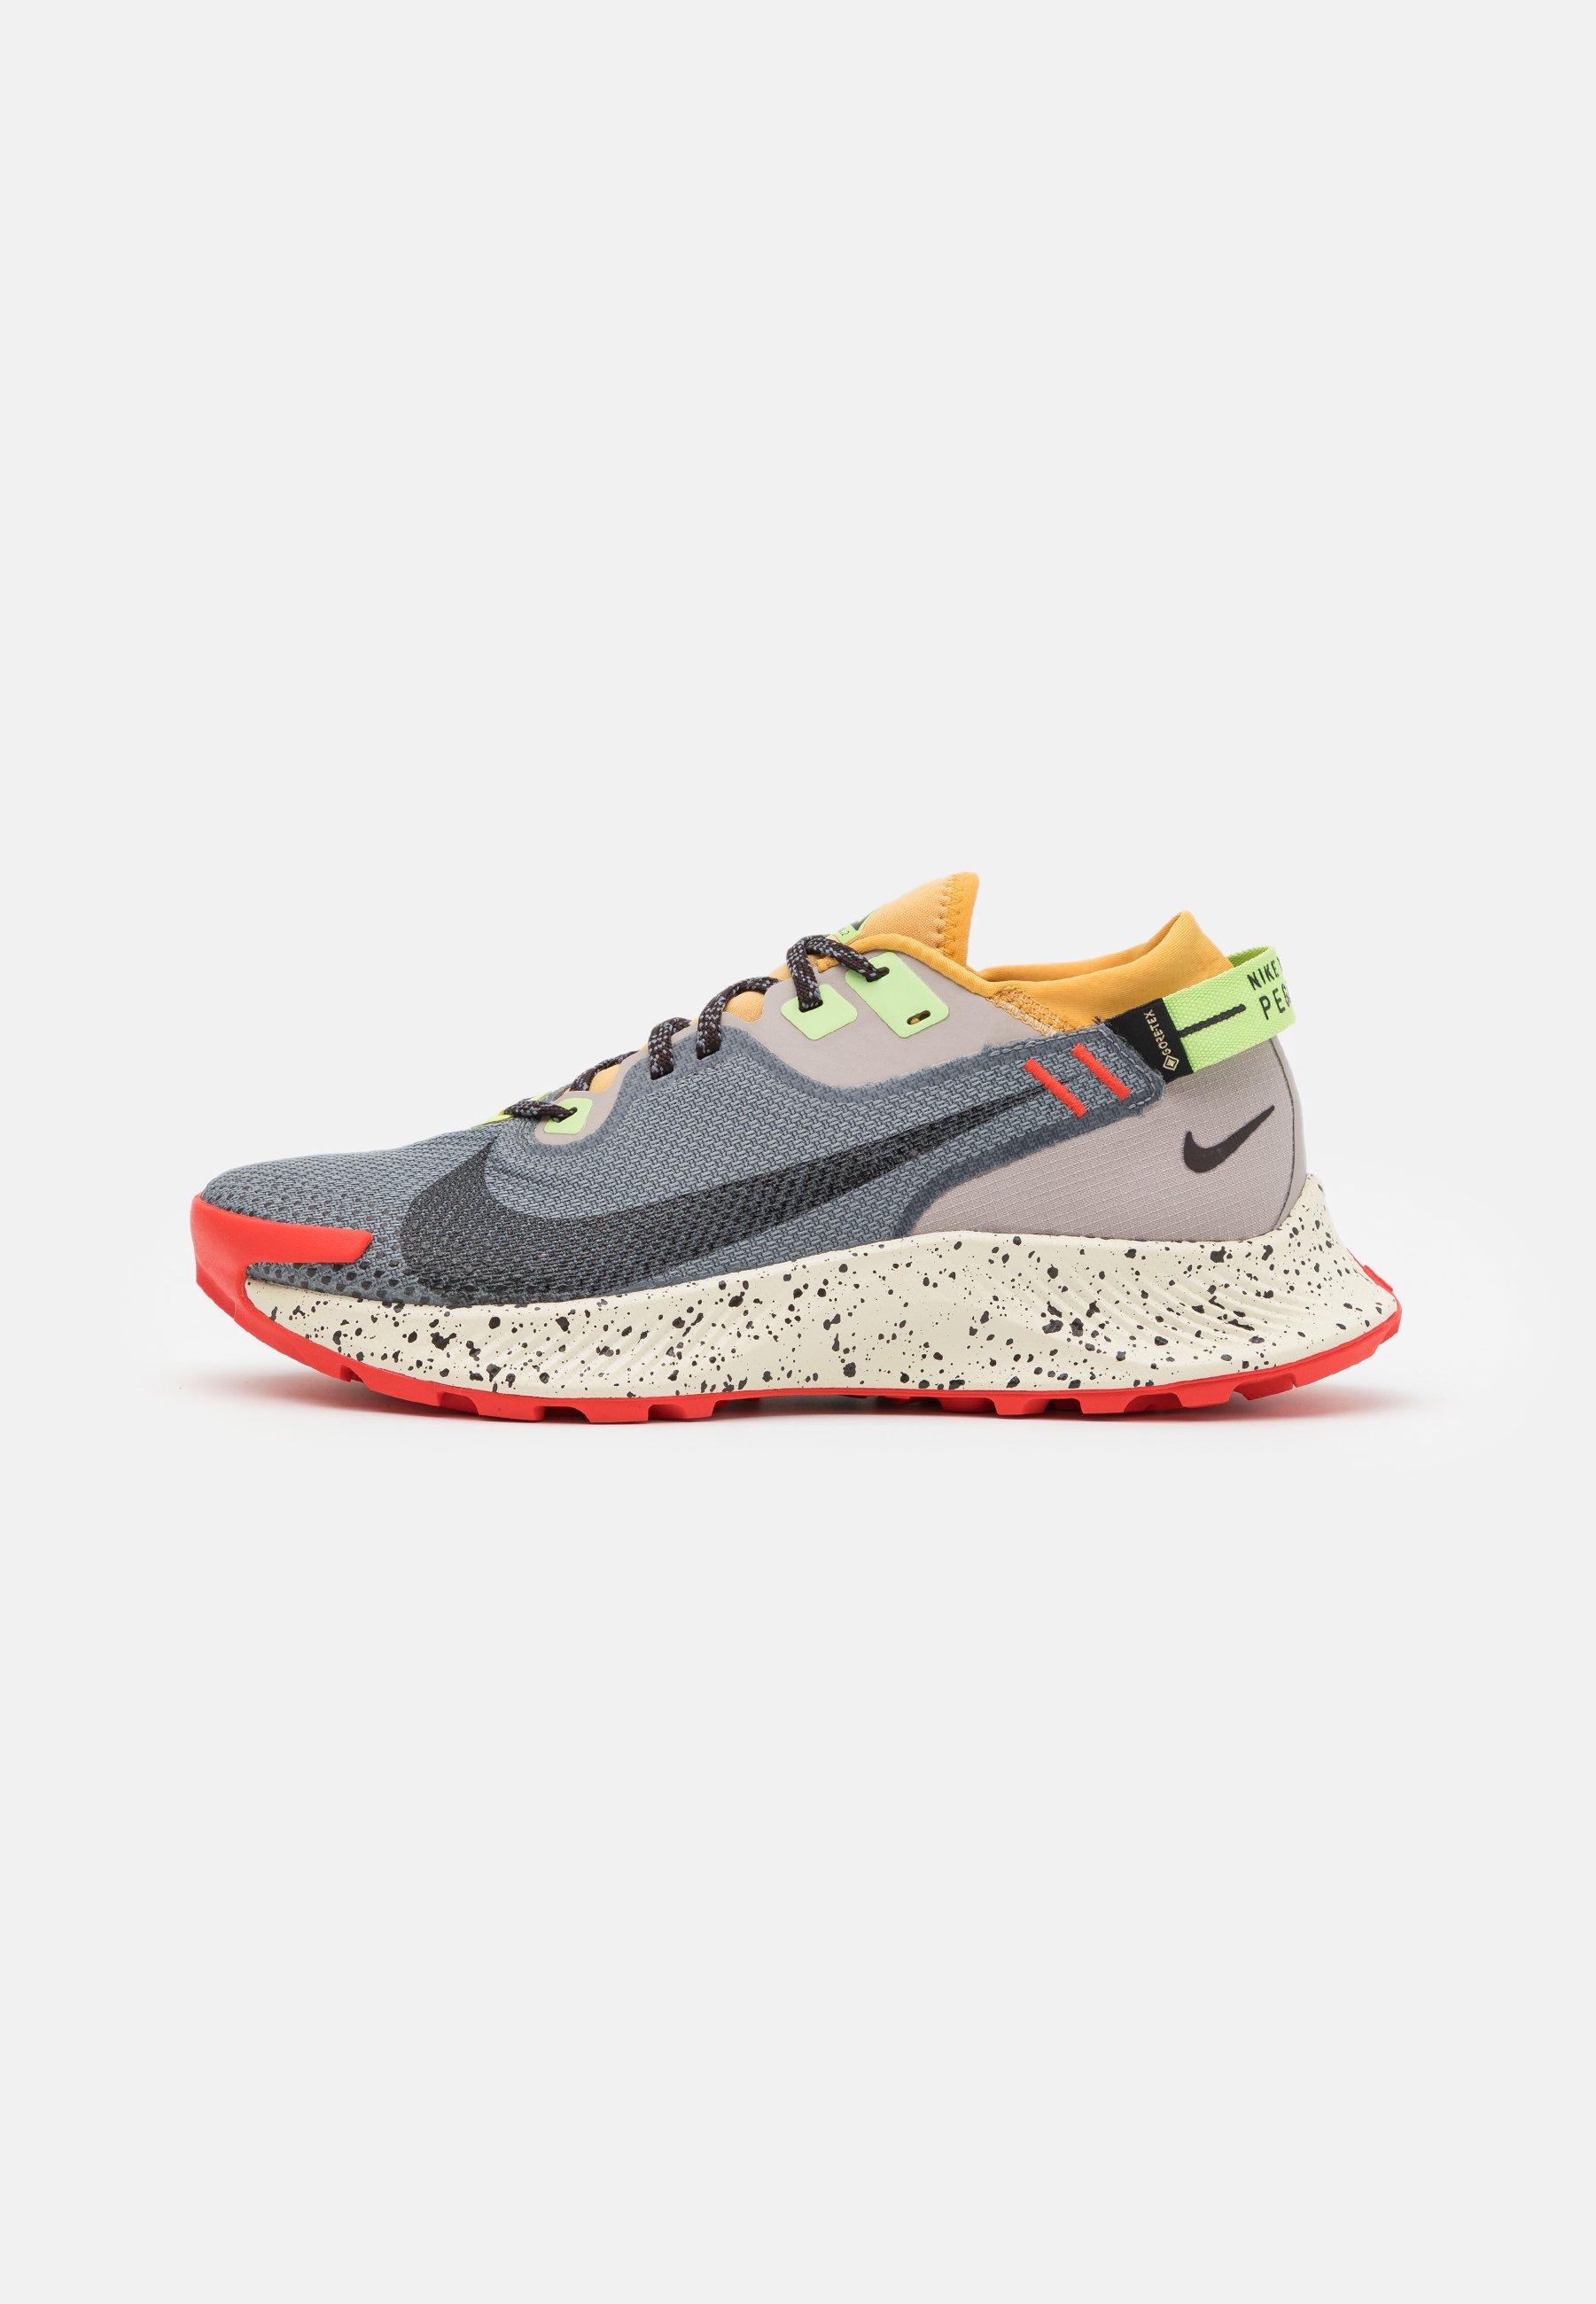 PEGASUS TRAIL 2 GTX - Chaussures de running - smoke grey/black/bucktan/college grey/key lime/chile red